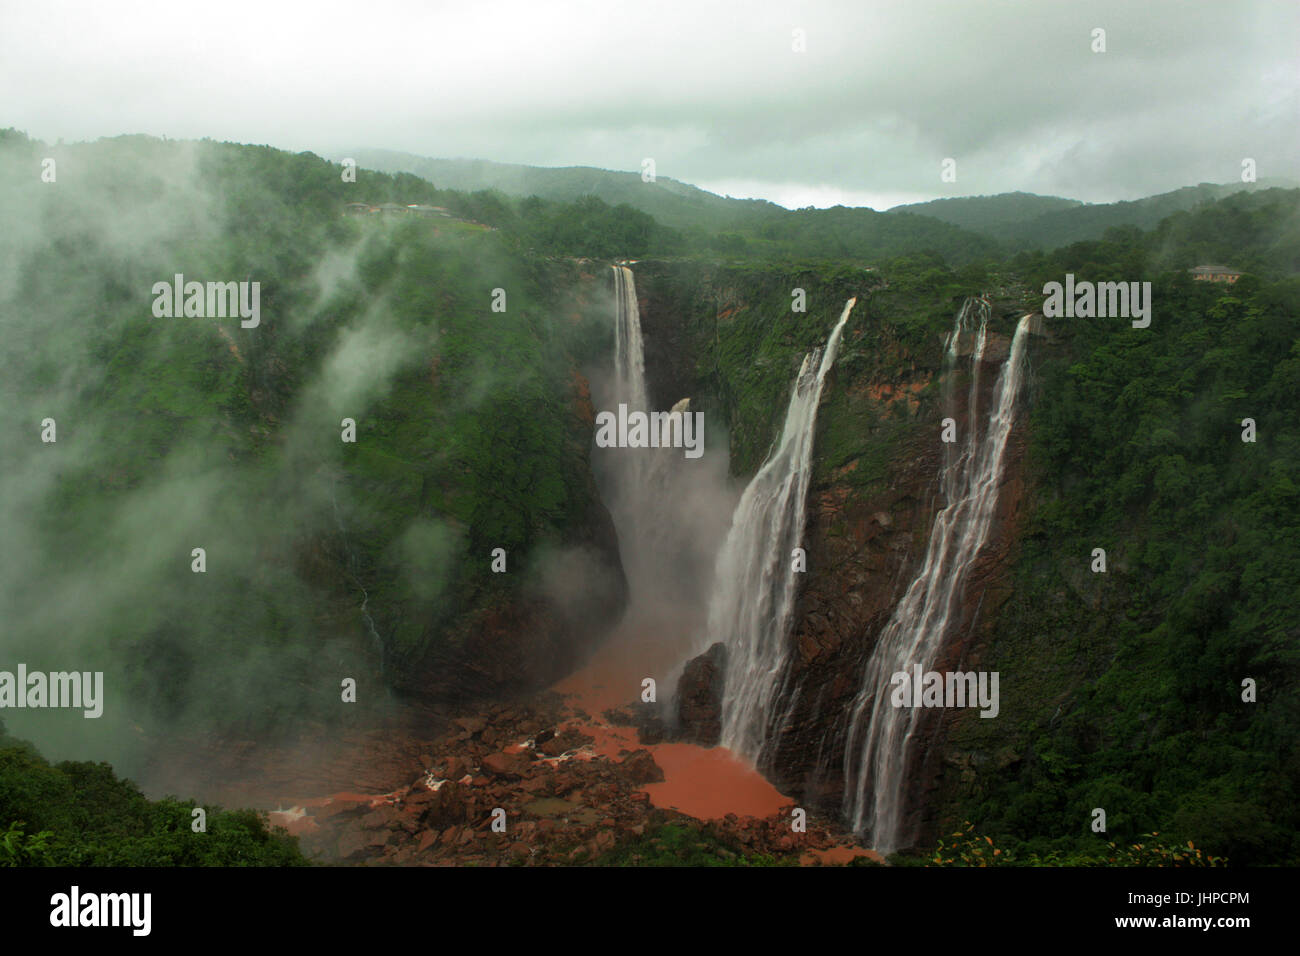 Jog Falls, Shimoga, Karnataka, India - Stock Image